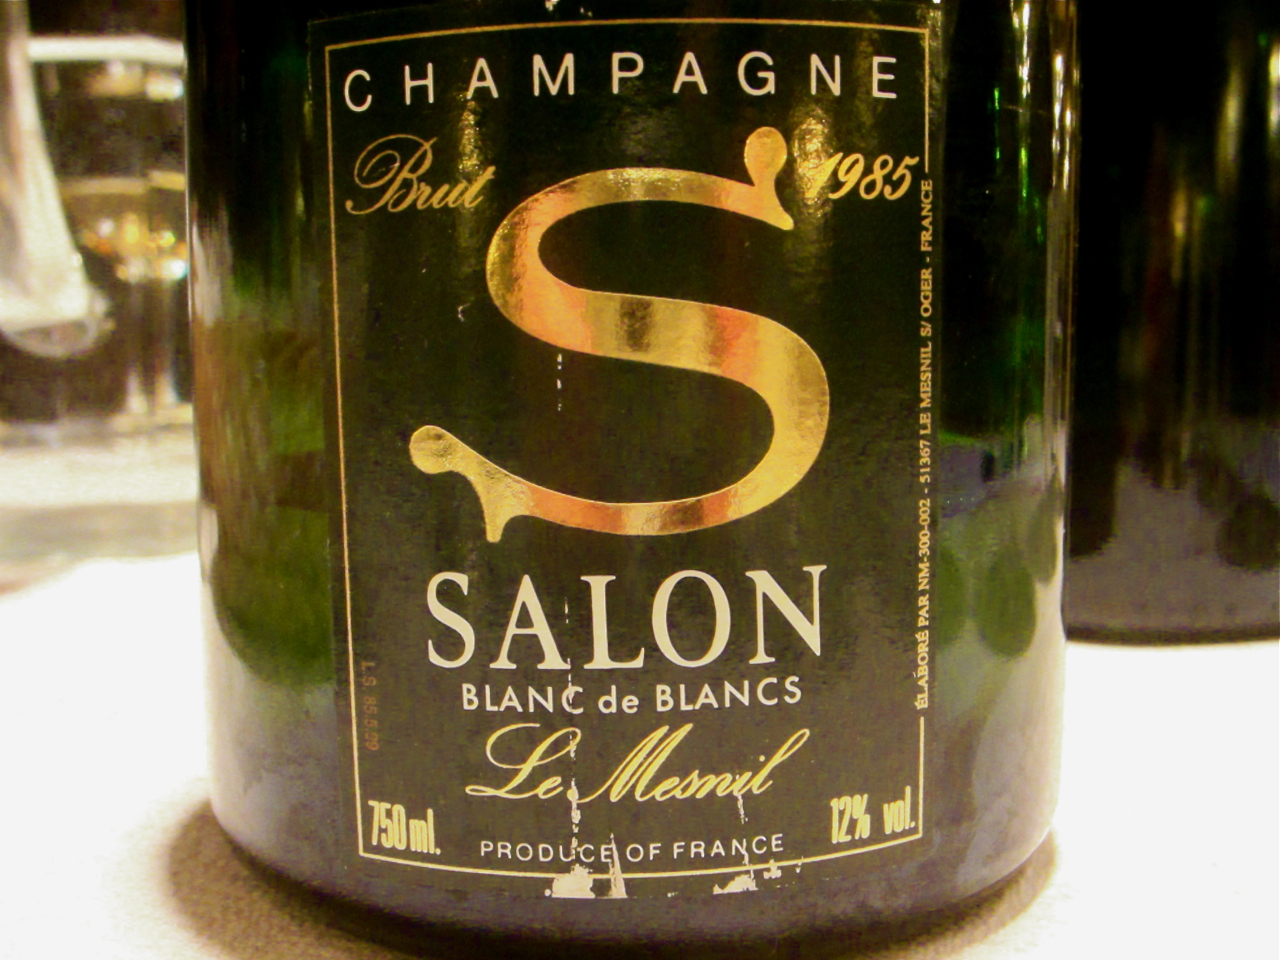 Finare vinare gubbamidda med bubbel for 1985 salon champagne